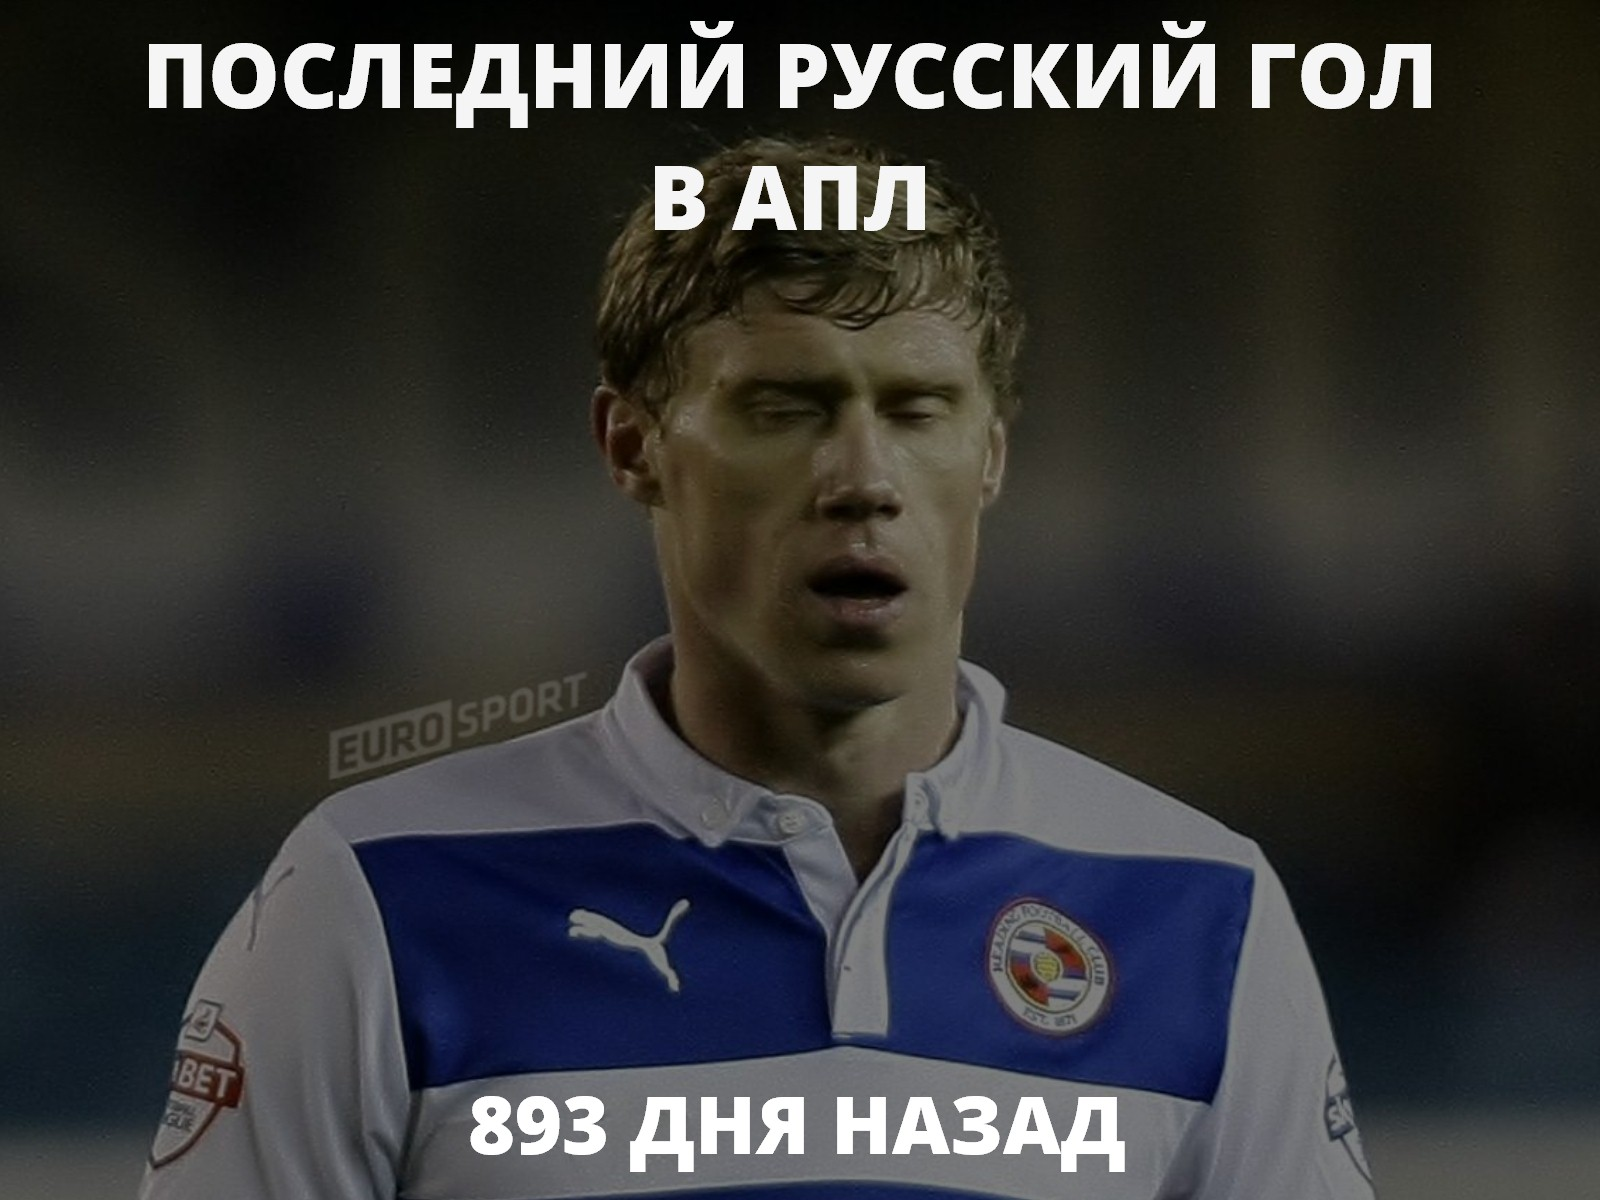 Фото как русские забивают гол фото 587-606